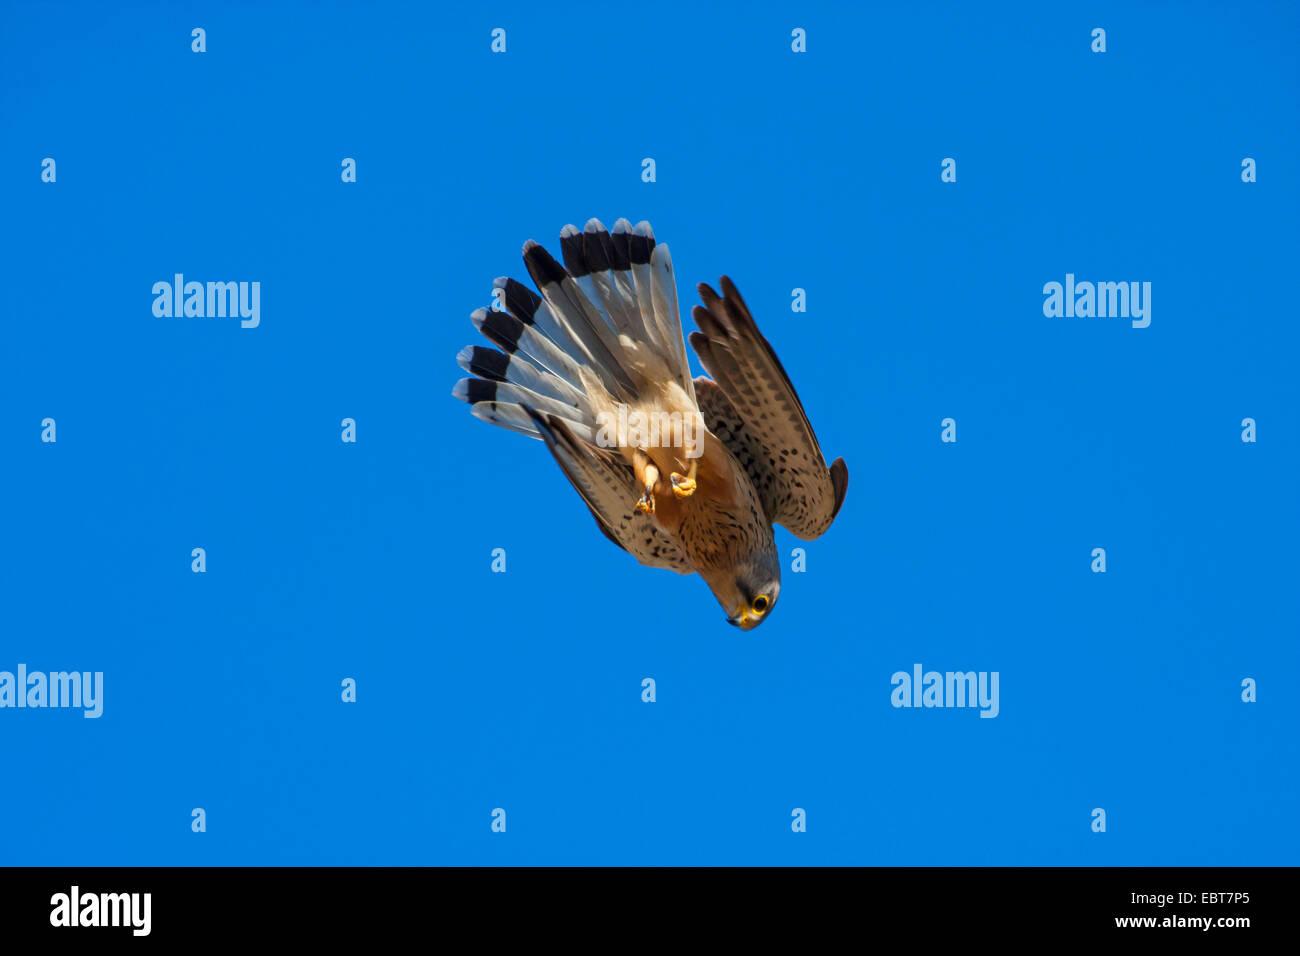 European Kestrel, Eurasian Kestrel, Old World Kestrel, Common Kestrel (Falco tinnunculus), in nose dive, Switzerland, - Stock Image